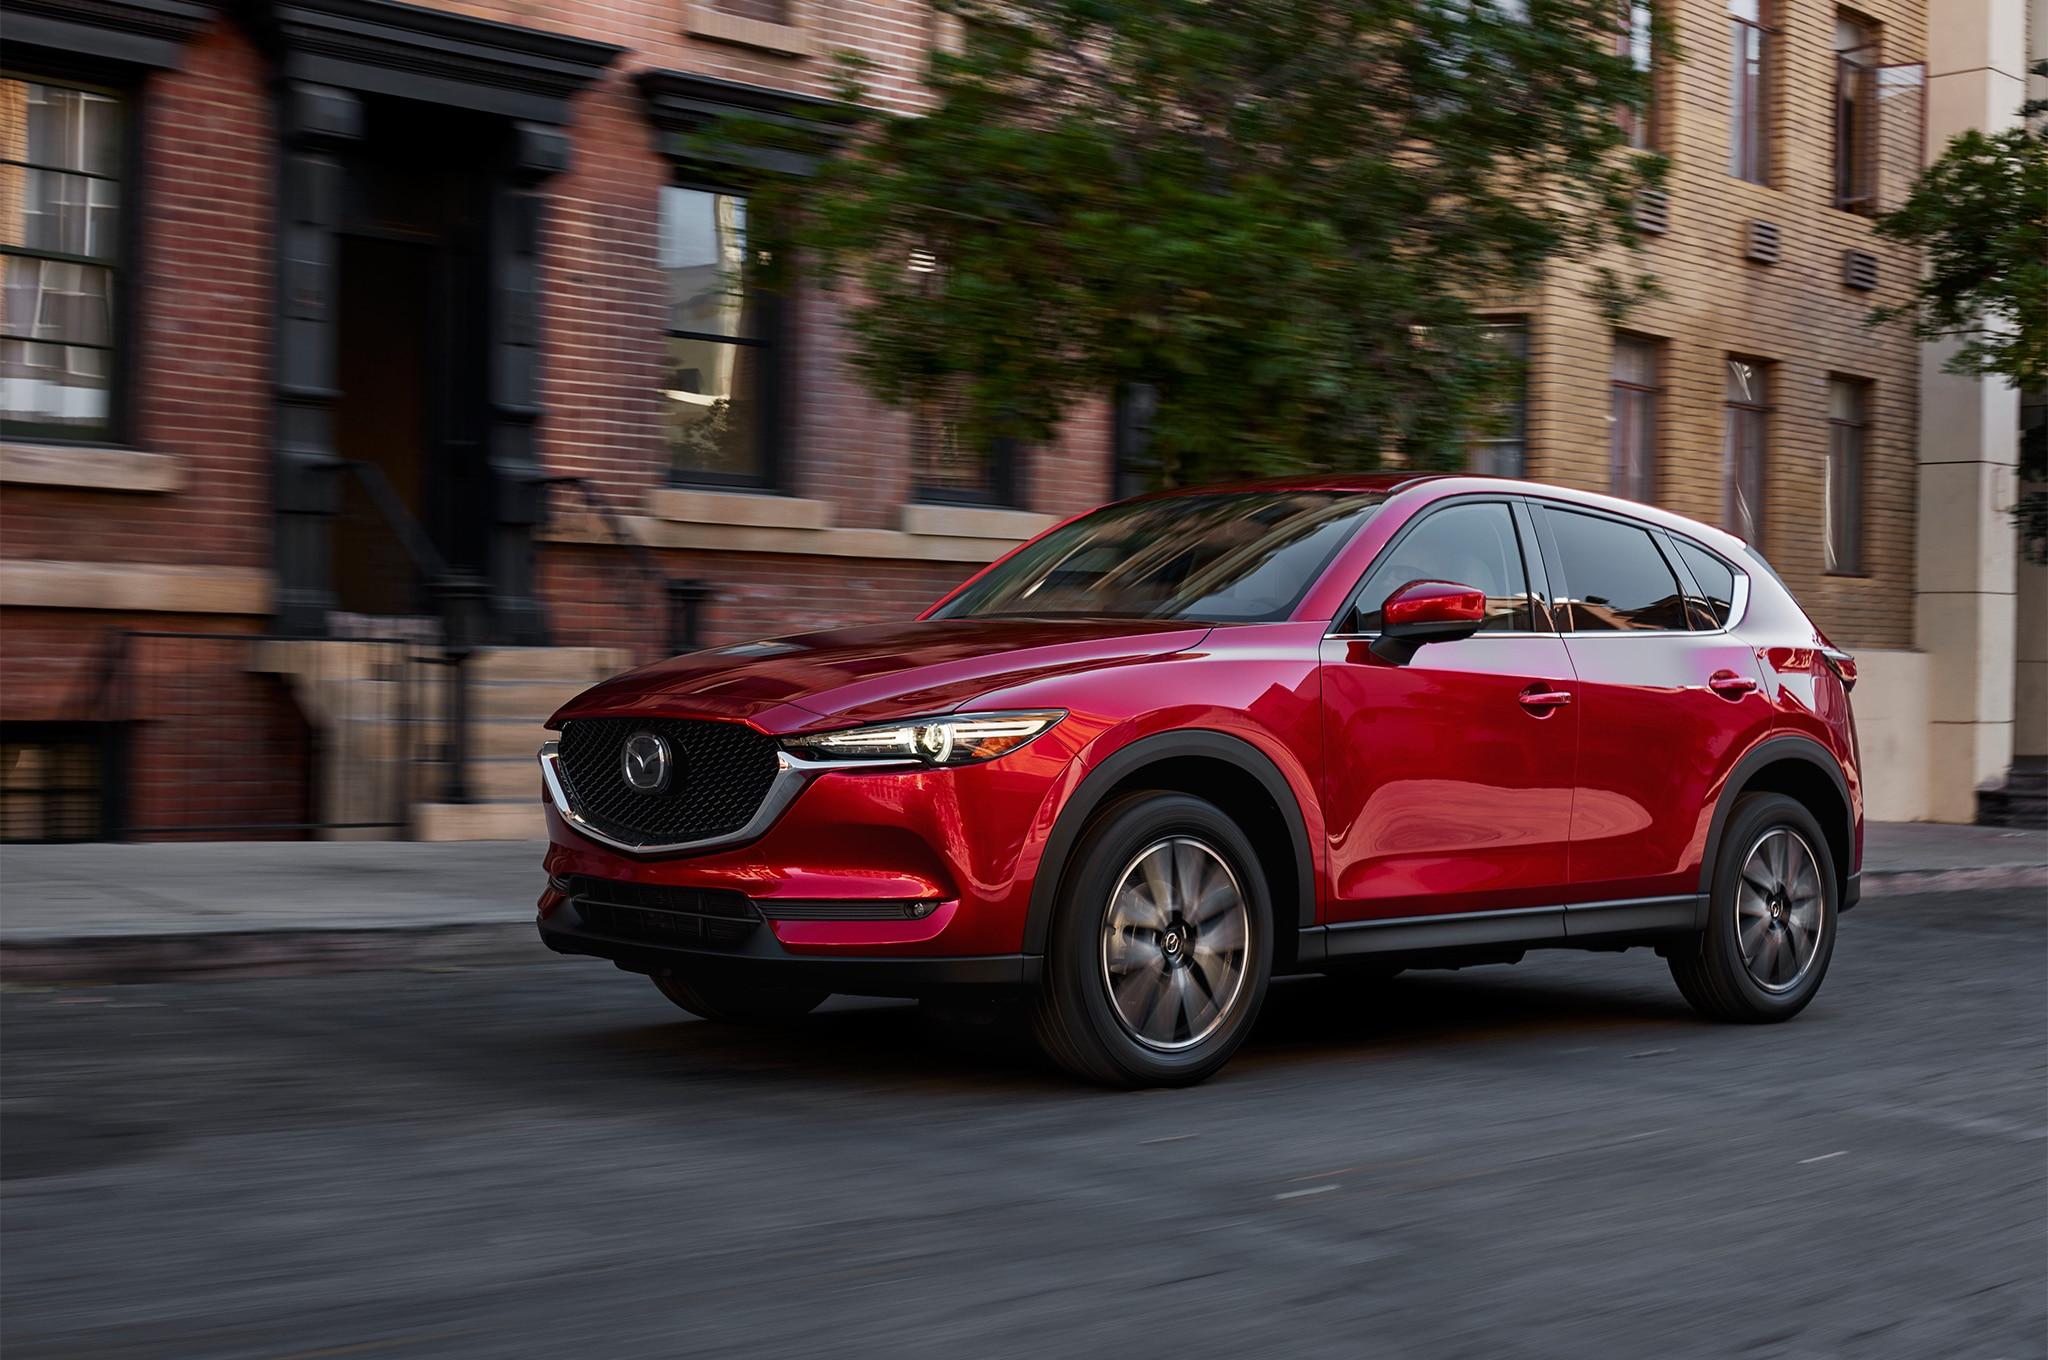 2017 Mazda CX 5 Front Three Quarter In Motion 1